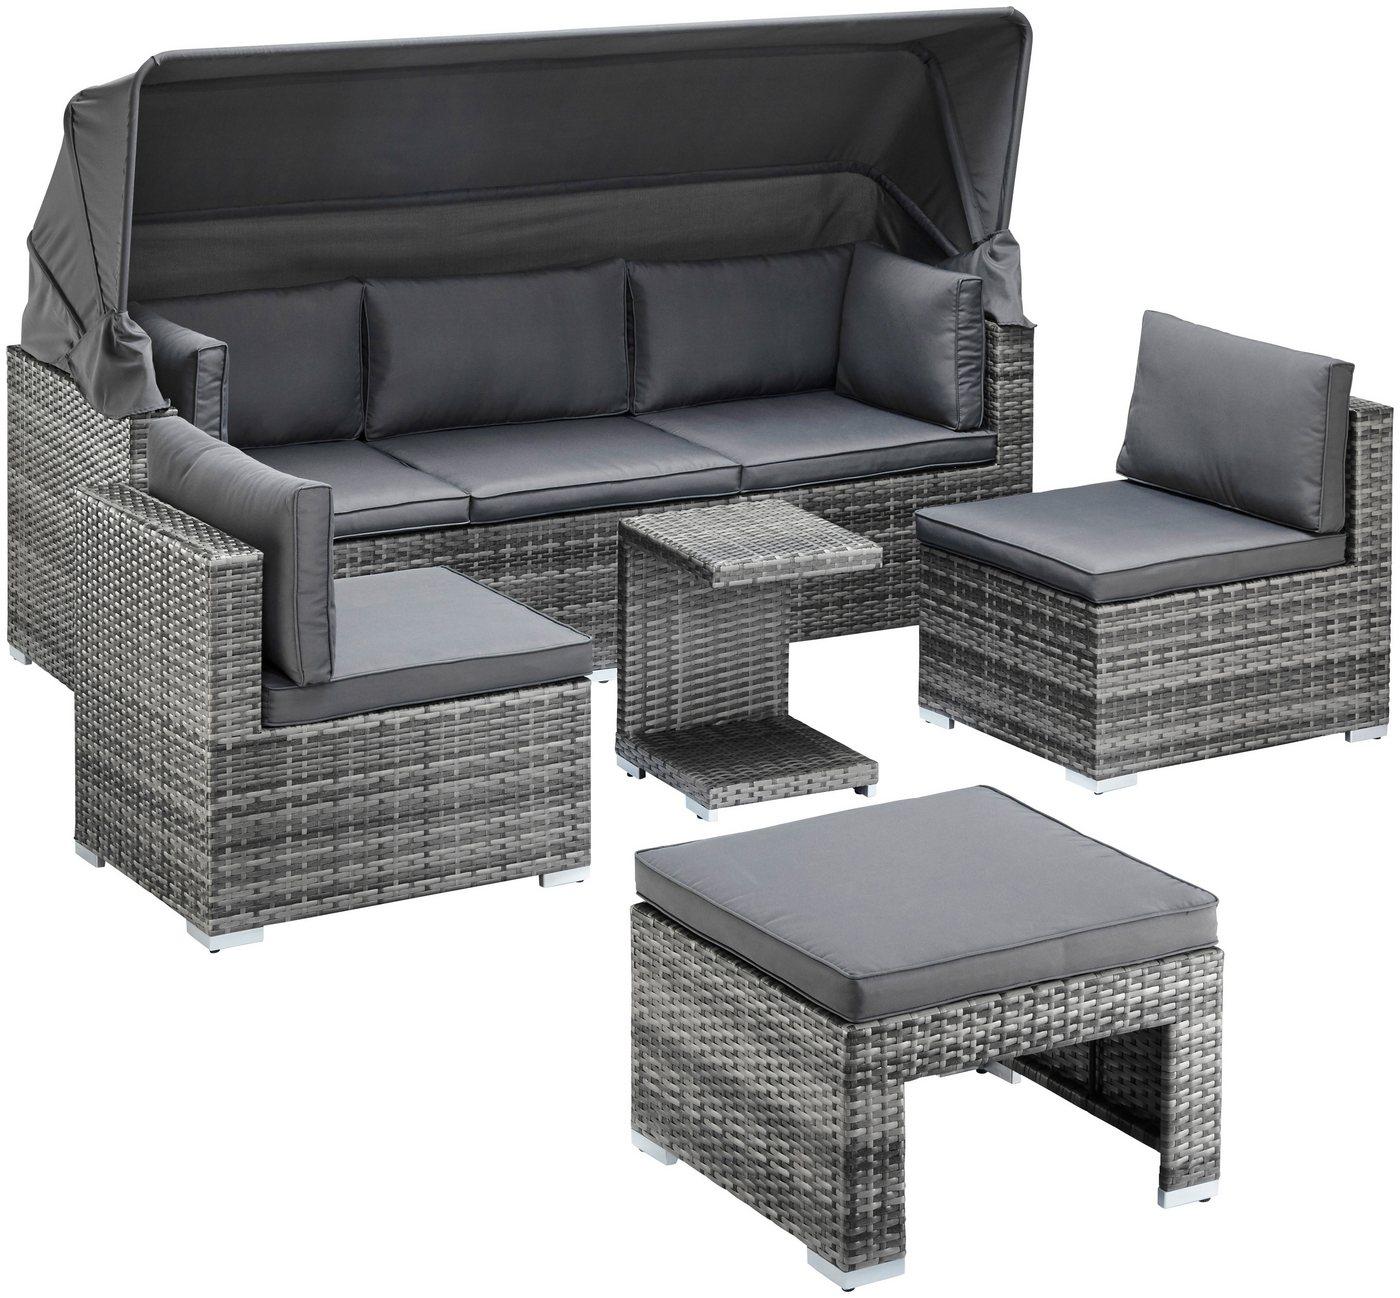 25 sparen loungebett atlanta nur 599 99 cherry. Black Bedroom Furniture Sets. Home Design Ideas